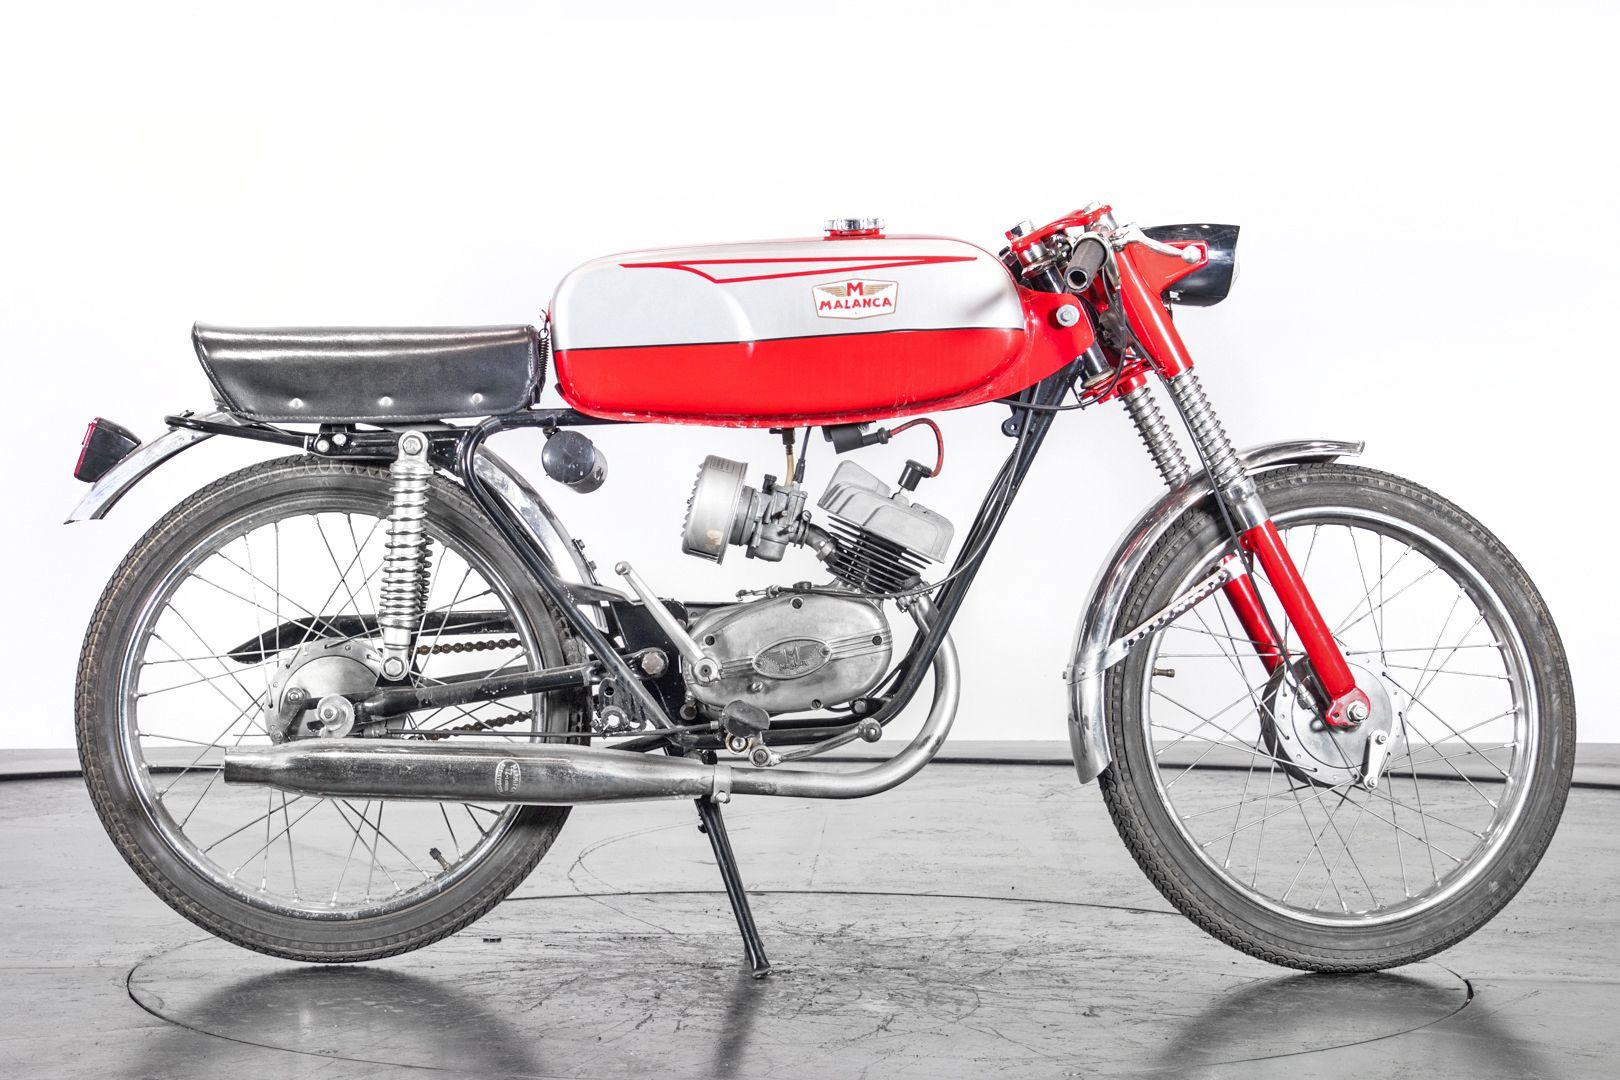 1963 Malanca Sport 41174